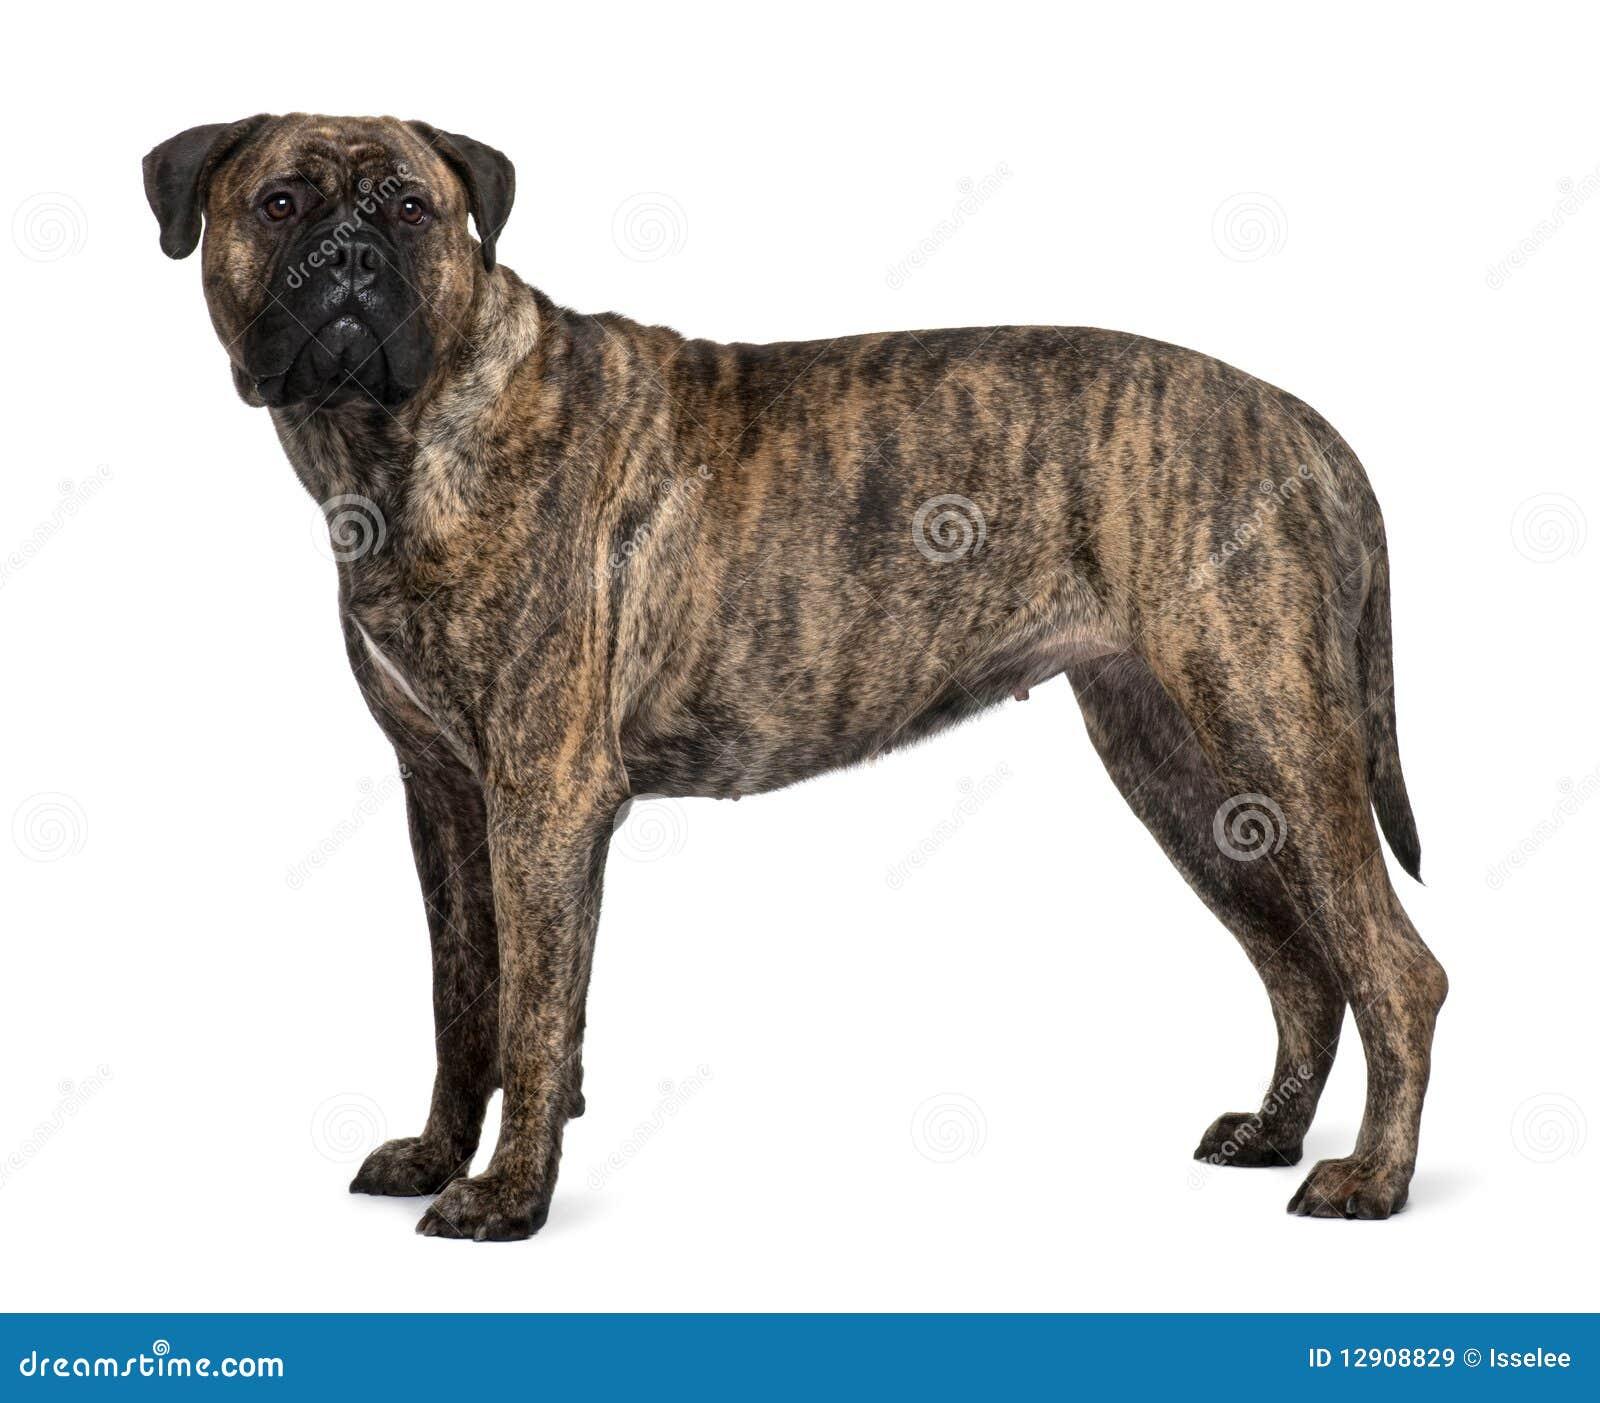 Profile of Bullmastiff dog, standing